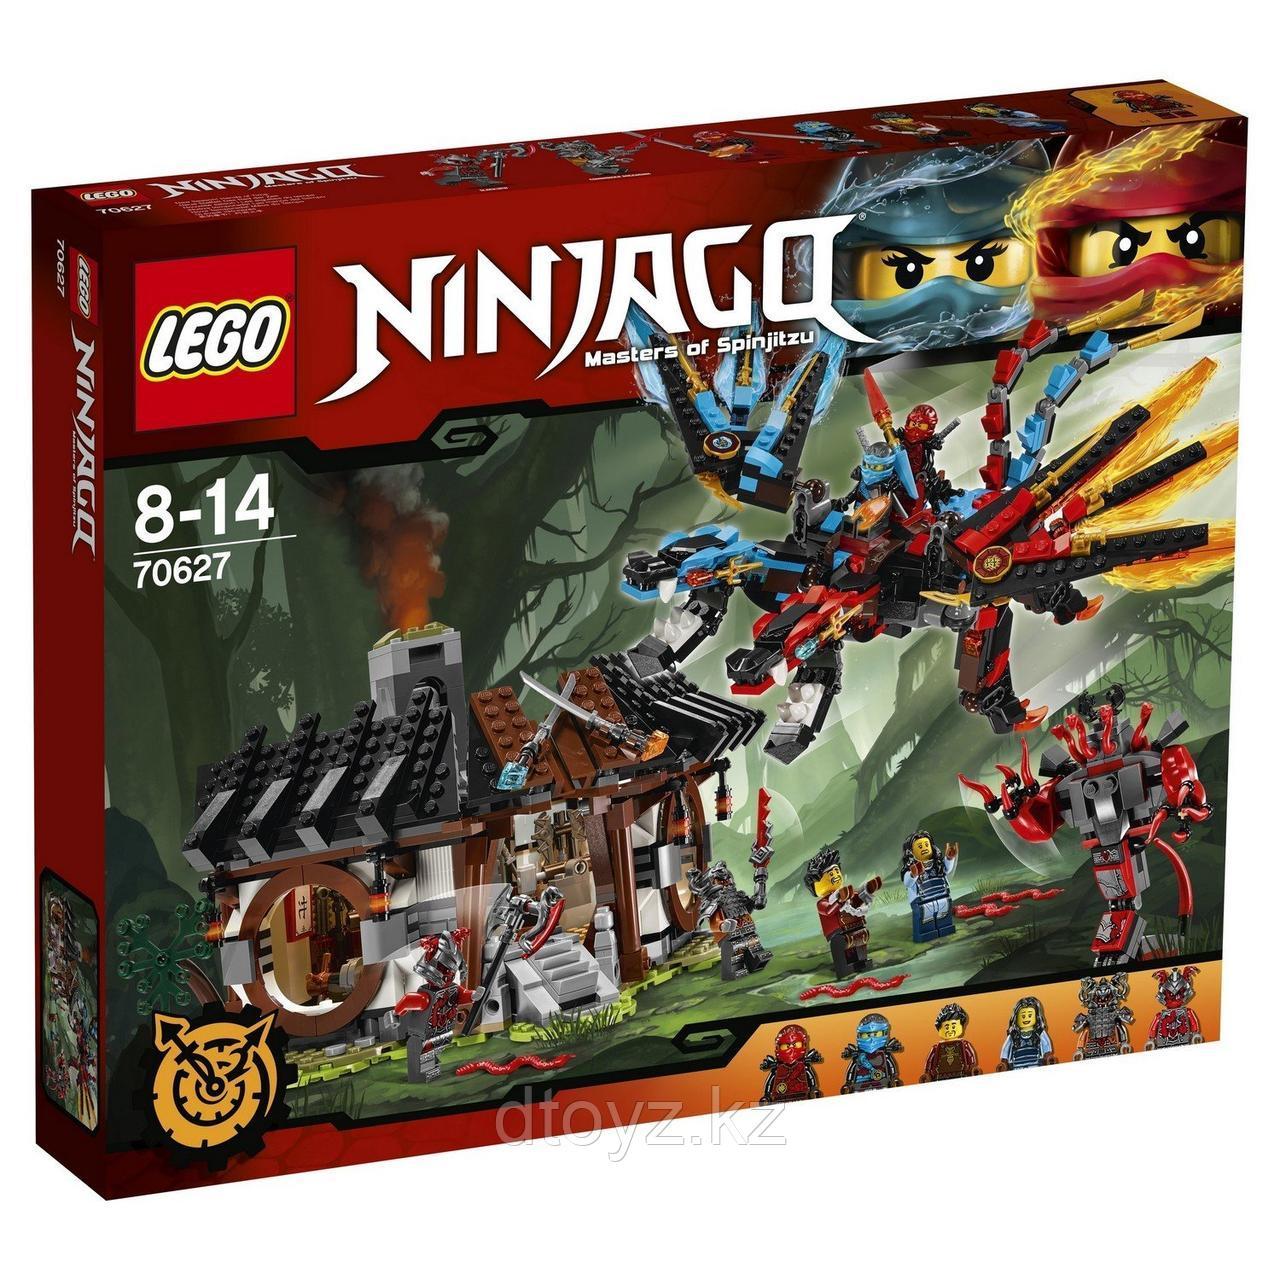 Lego Ninjago 70627 Кузница Дракона, Лего Ниндзяго